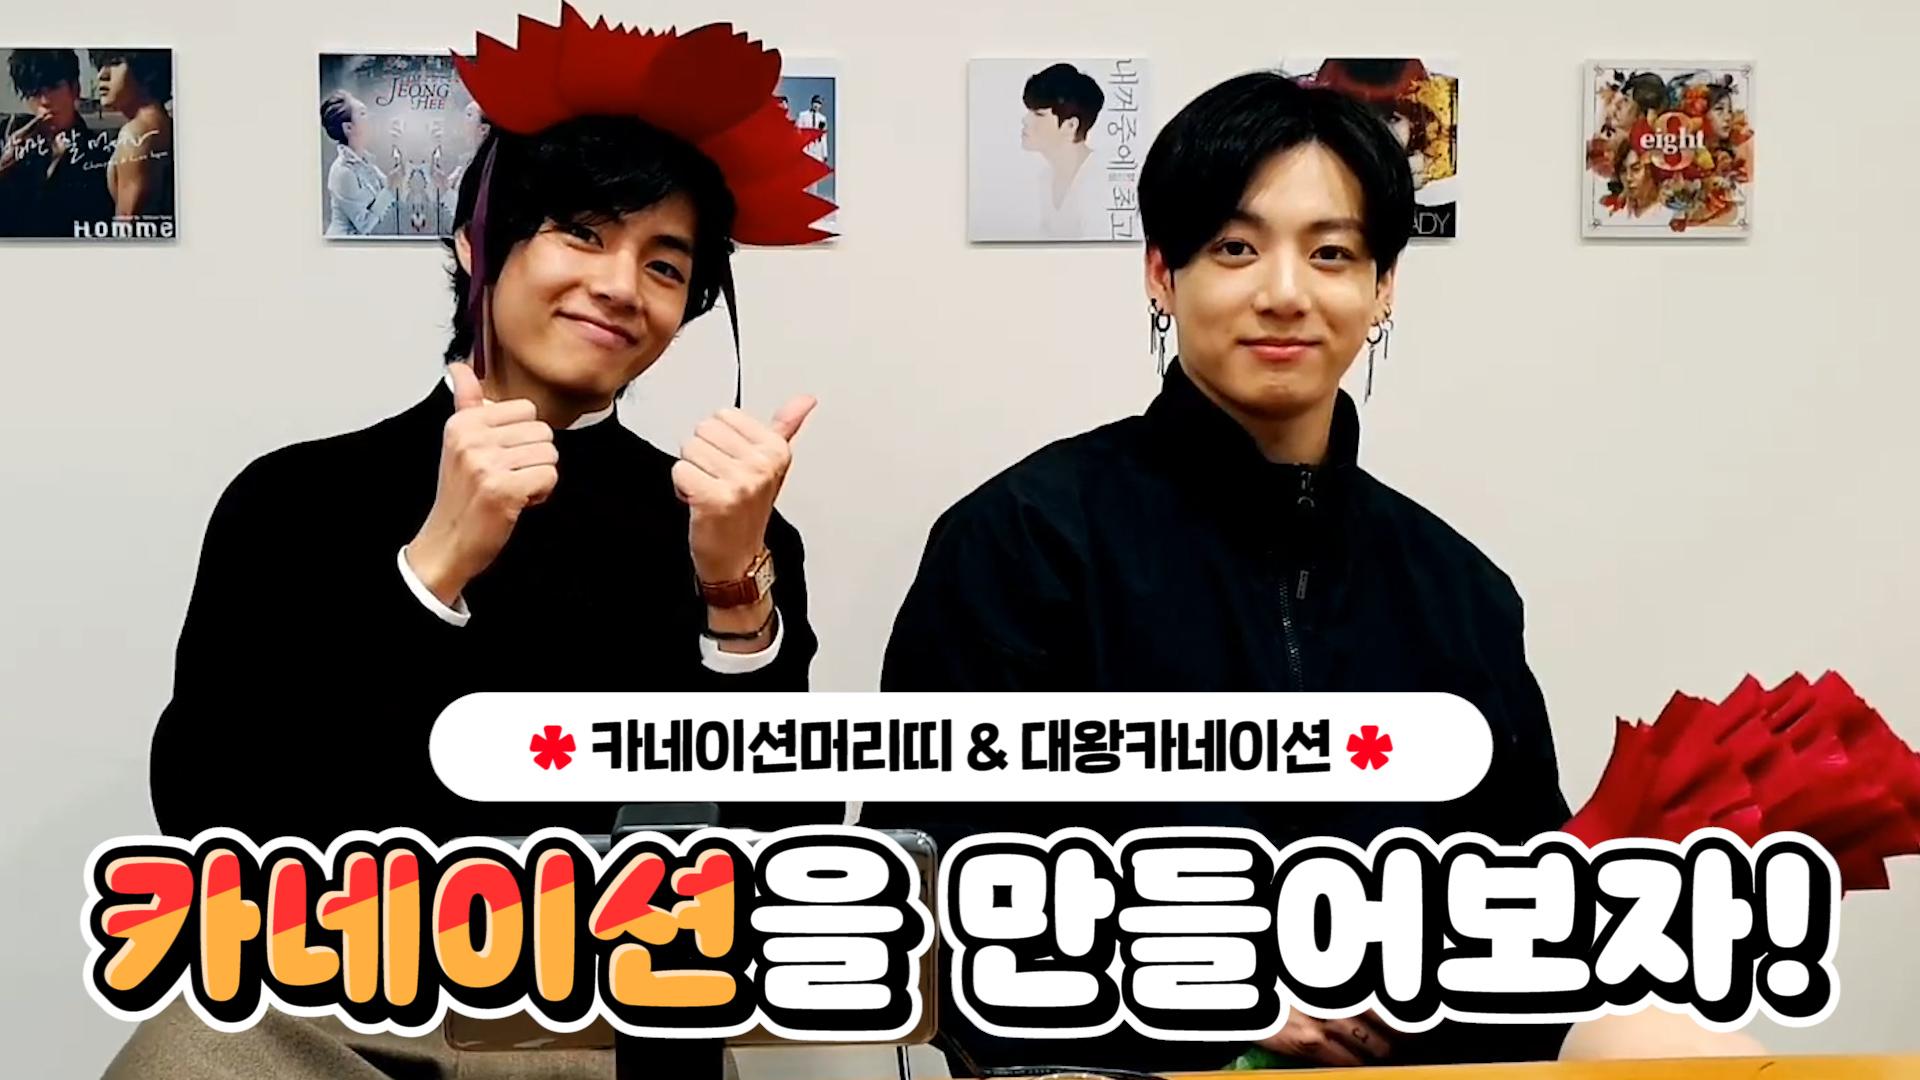 [BTS] 글루건이 아니라 초딩즈 깜찍함이 반칙이었음을..💐 (V&JUNGKOOK making carnations)